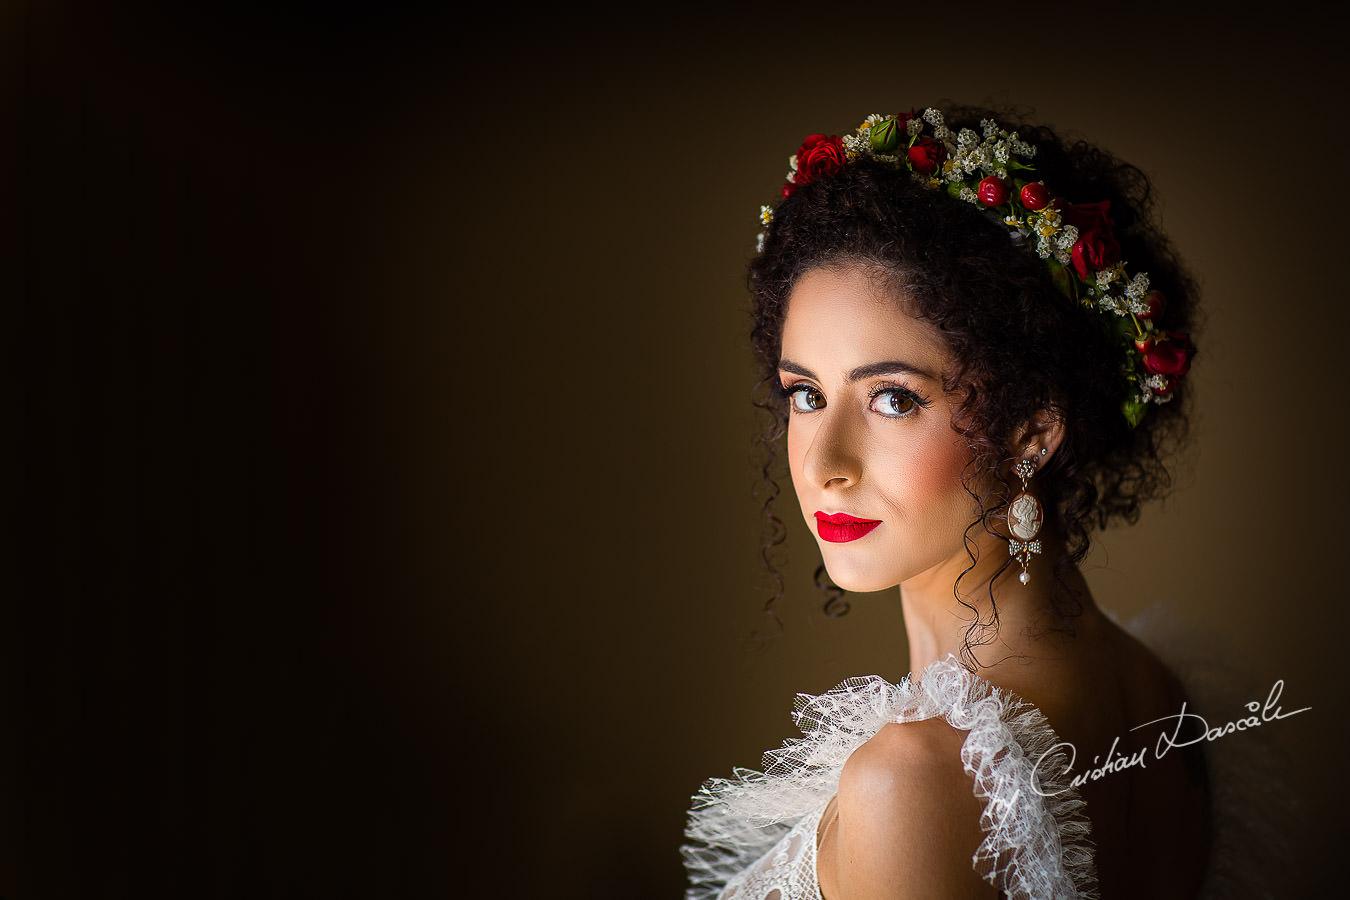 Bridal Portrait captured by Cyprus Wedding Photographer Cristian Dascalu at a beautiful wedding in Larnaka, Cyprus.